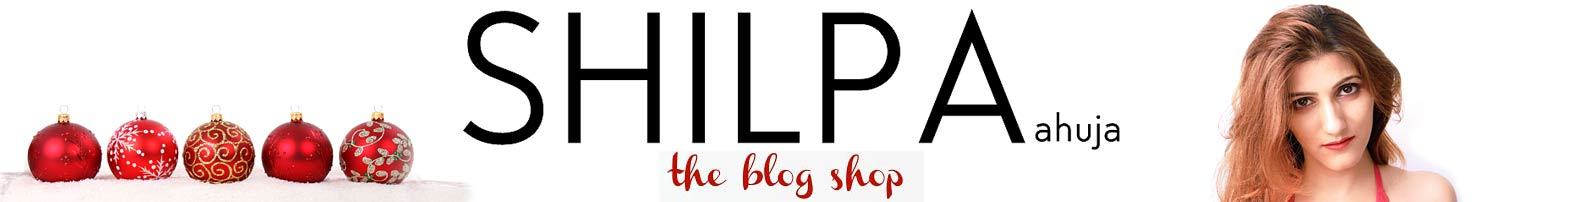 shilpa_ahuja-indian-fashion-blogger-indian-blog-shop